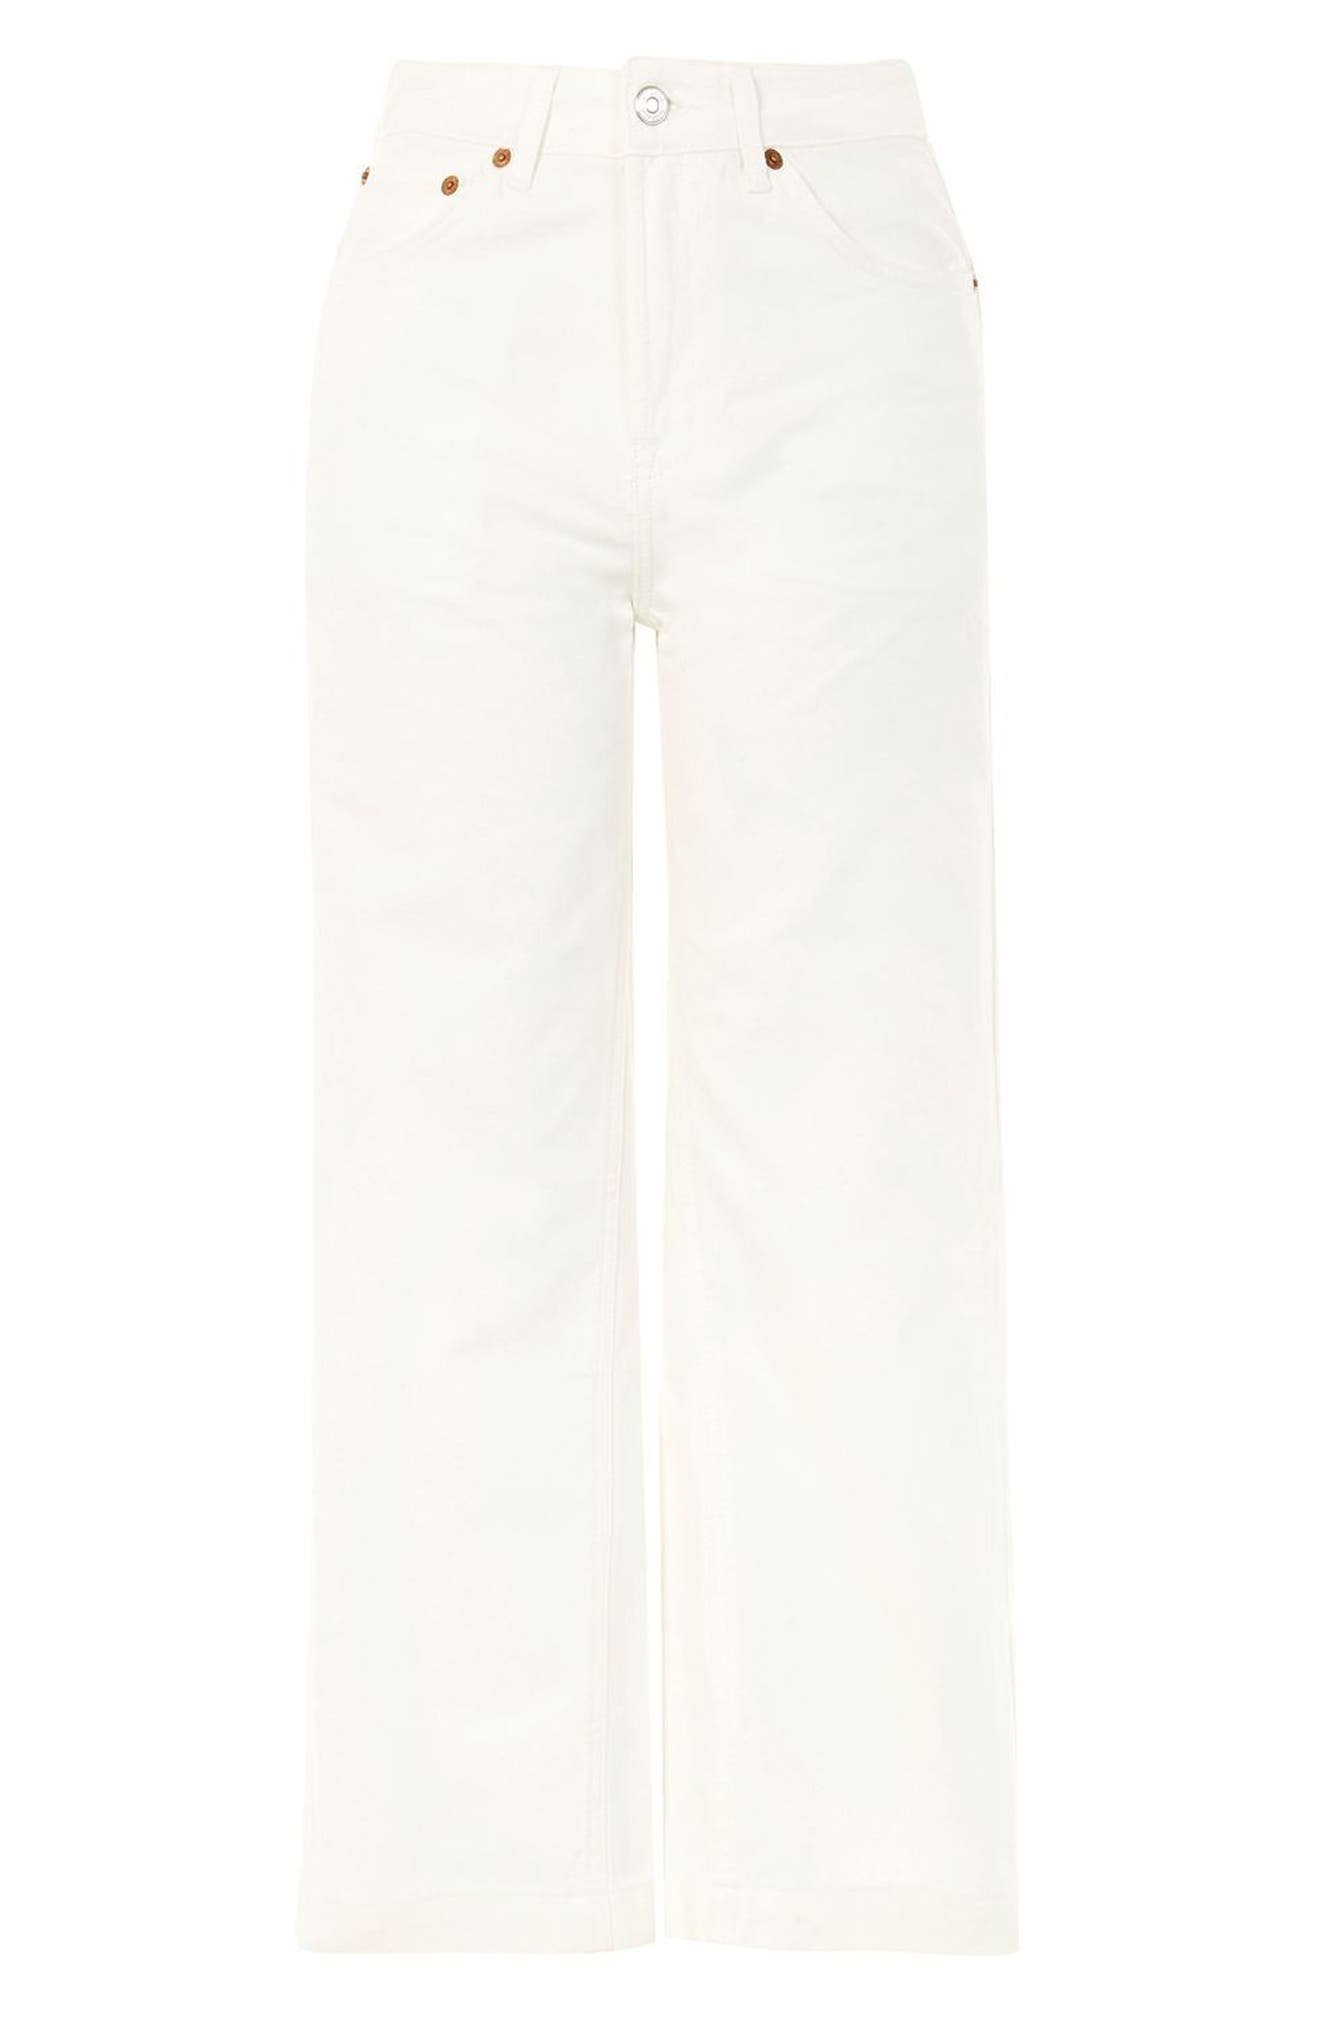 MOTO Cropped Wide Leg Non-Stretch Jeans,                             Alternate thumbnail 3, color,                             White